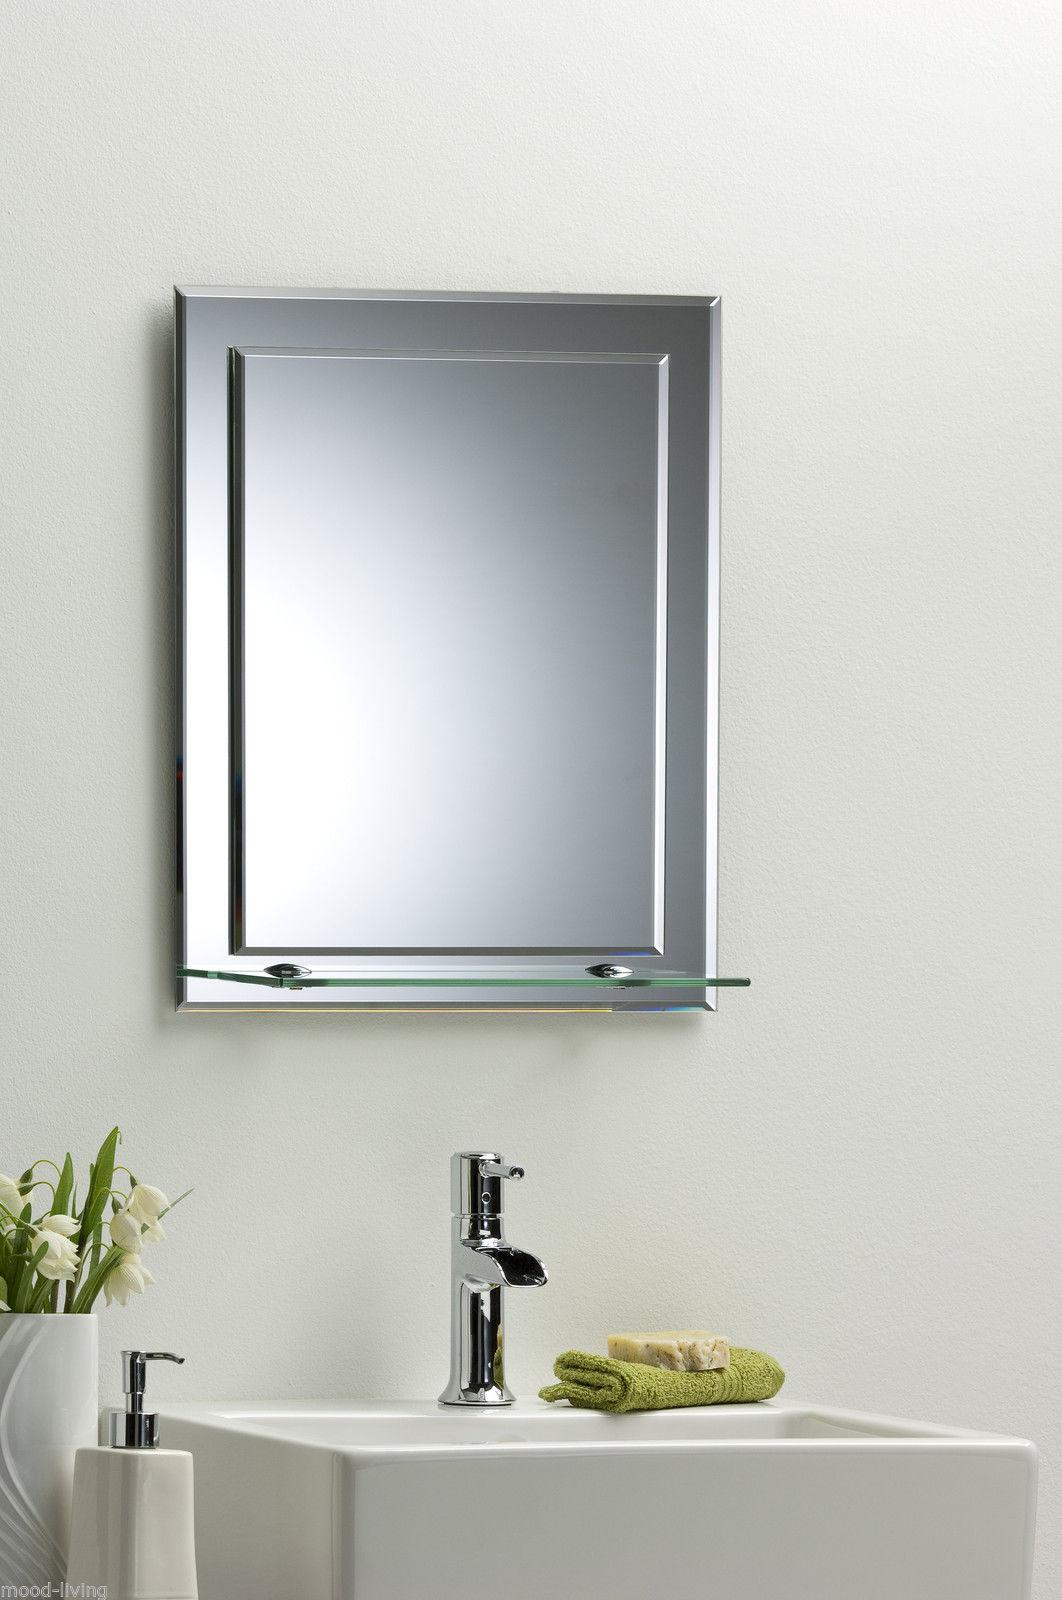 Bathroom mirror on mirror elegant rectangular with shelf - Silver bathroom mirror rectangular ...